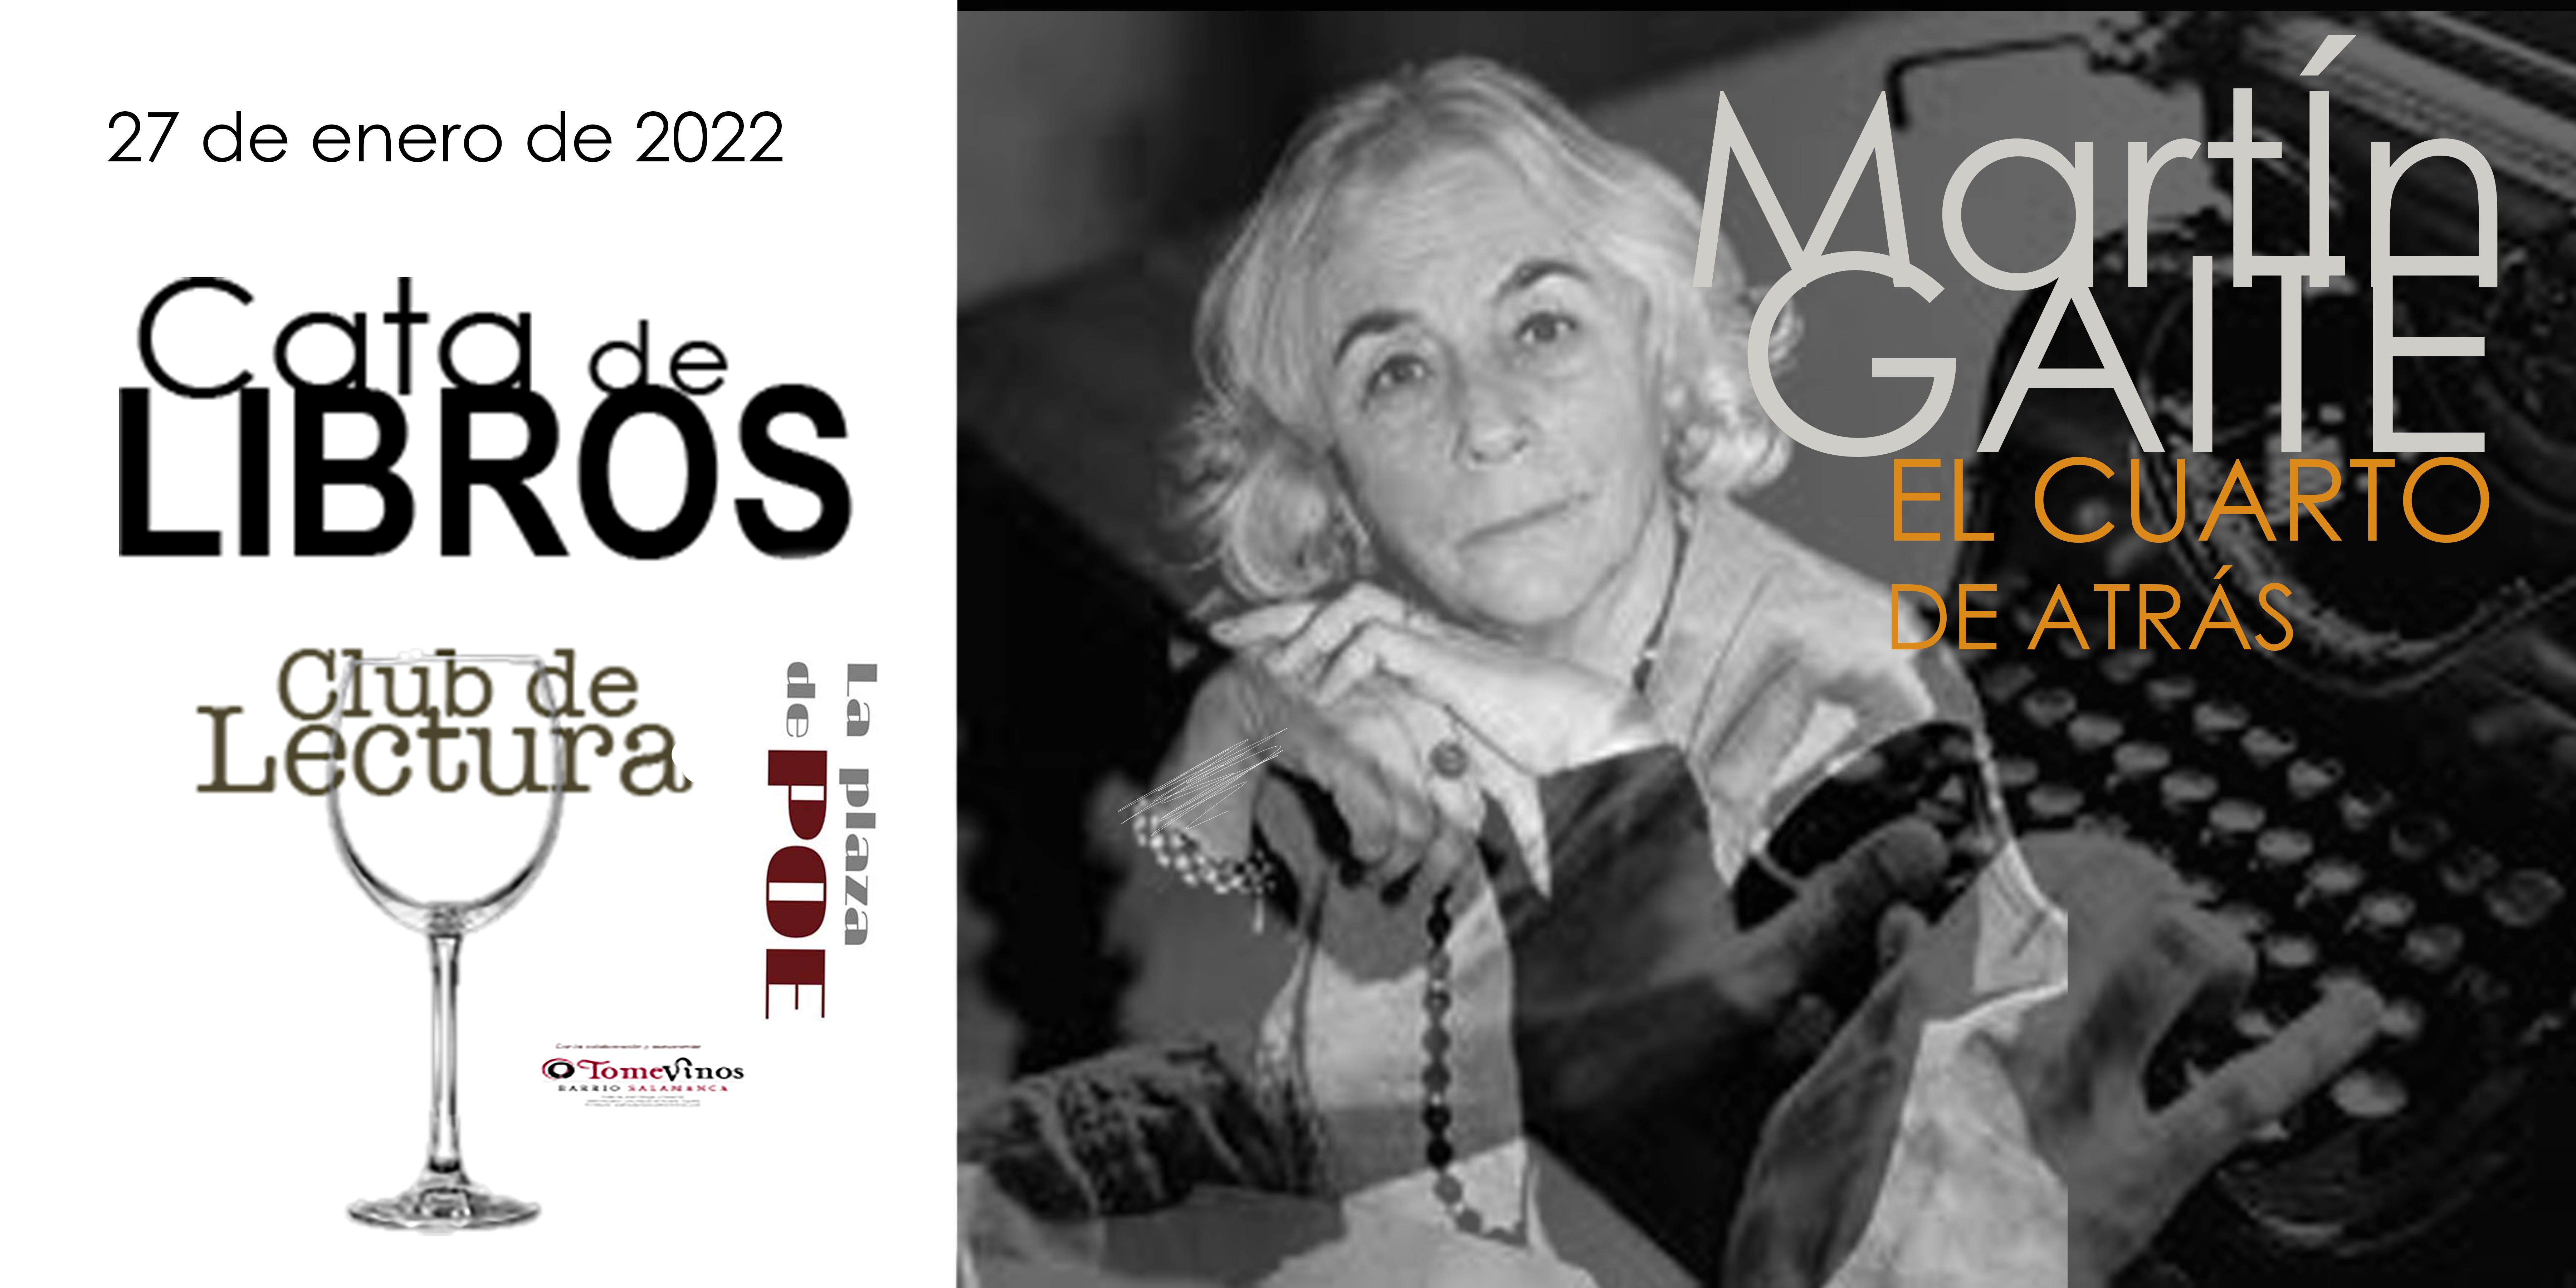 banner-cata-martin-gaite-el-cuarto-de-atracc81s-